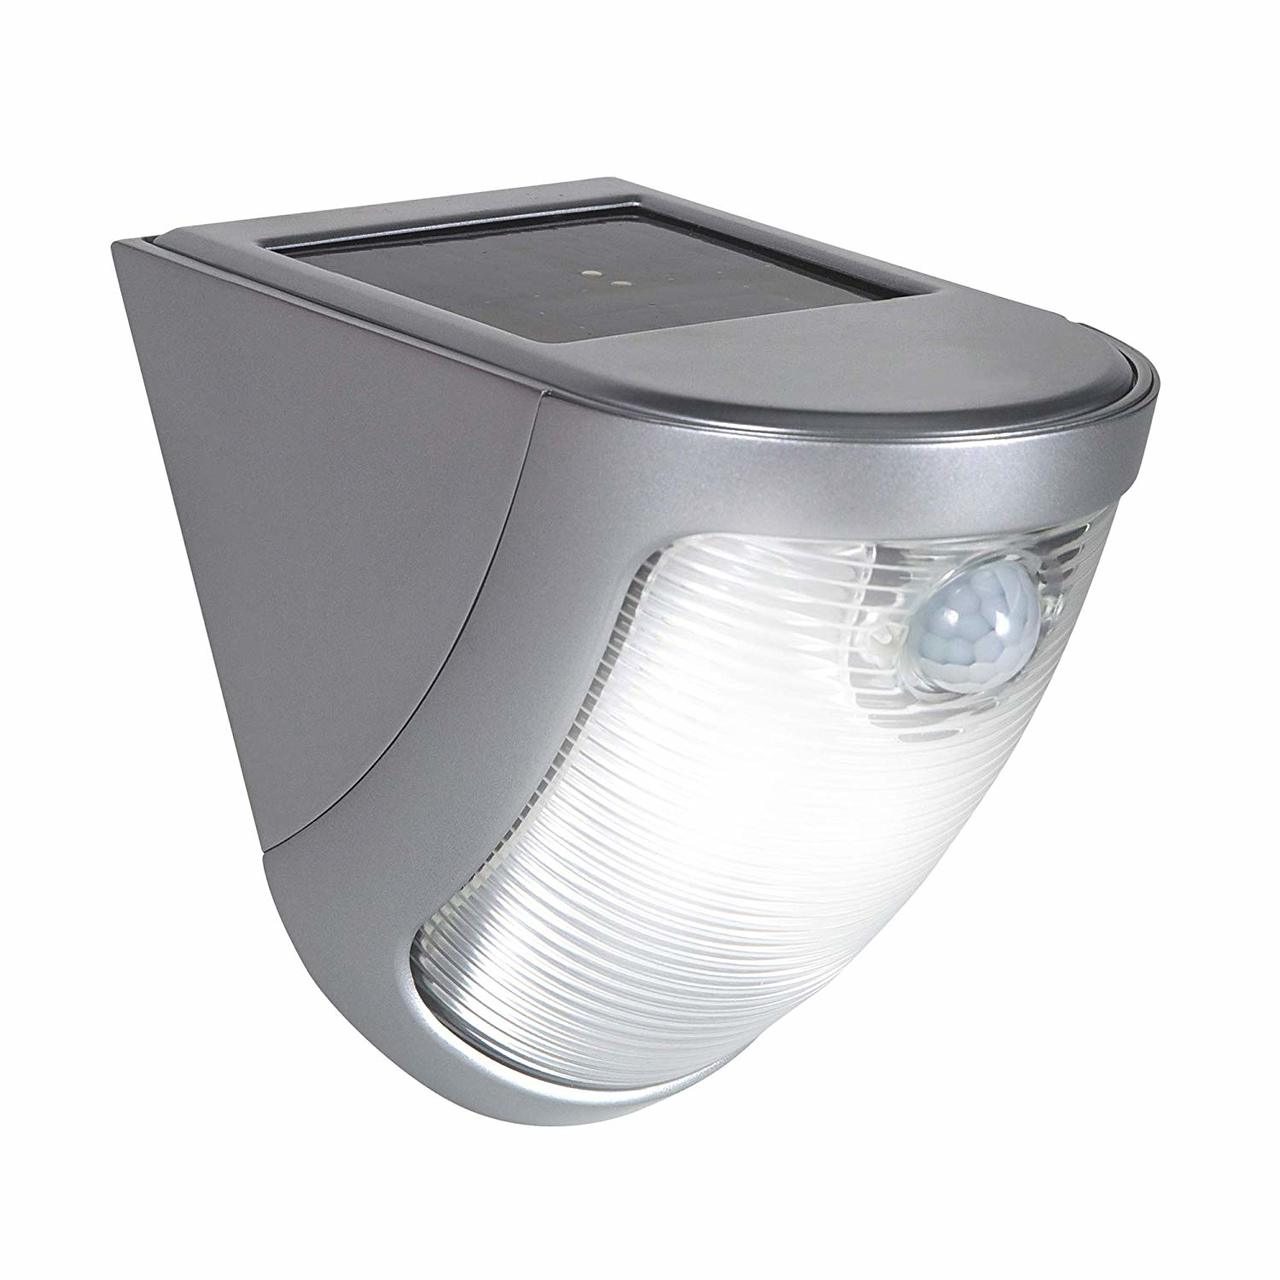 DURACELL SOLAR SECURITY LIGHT - 90 LUMEN MOTION SENSOR